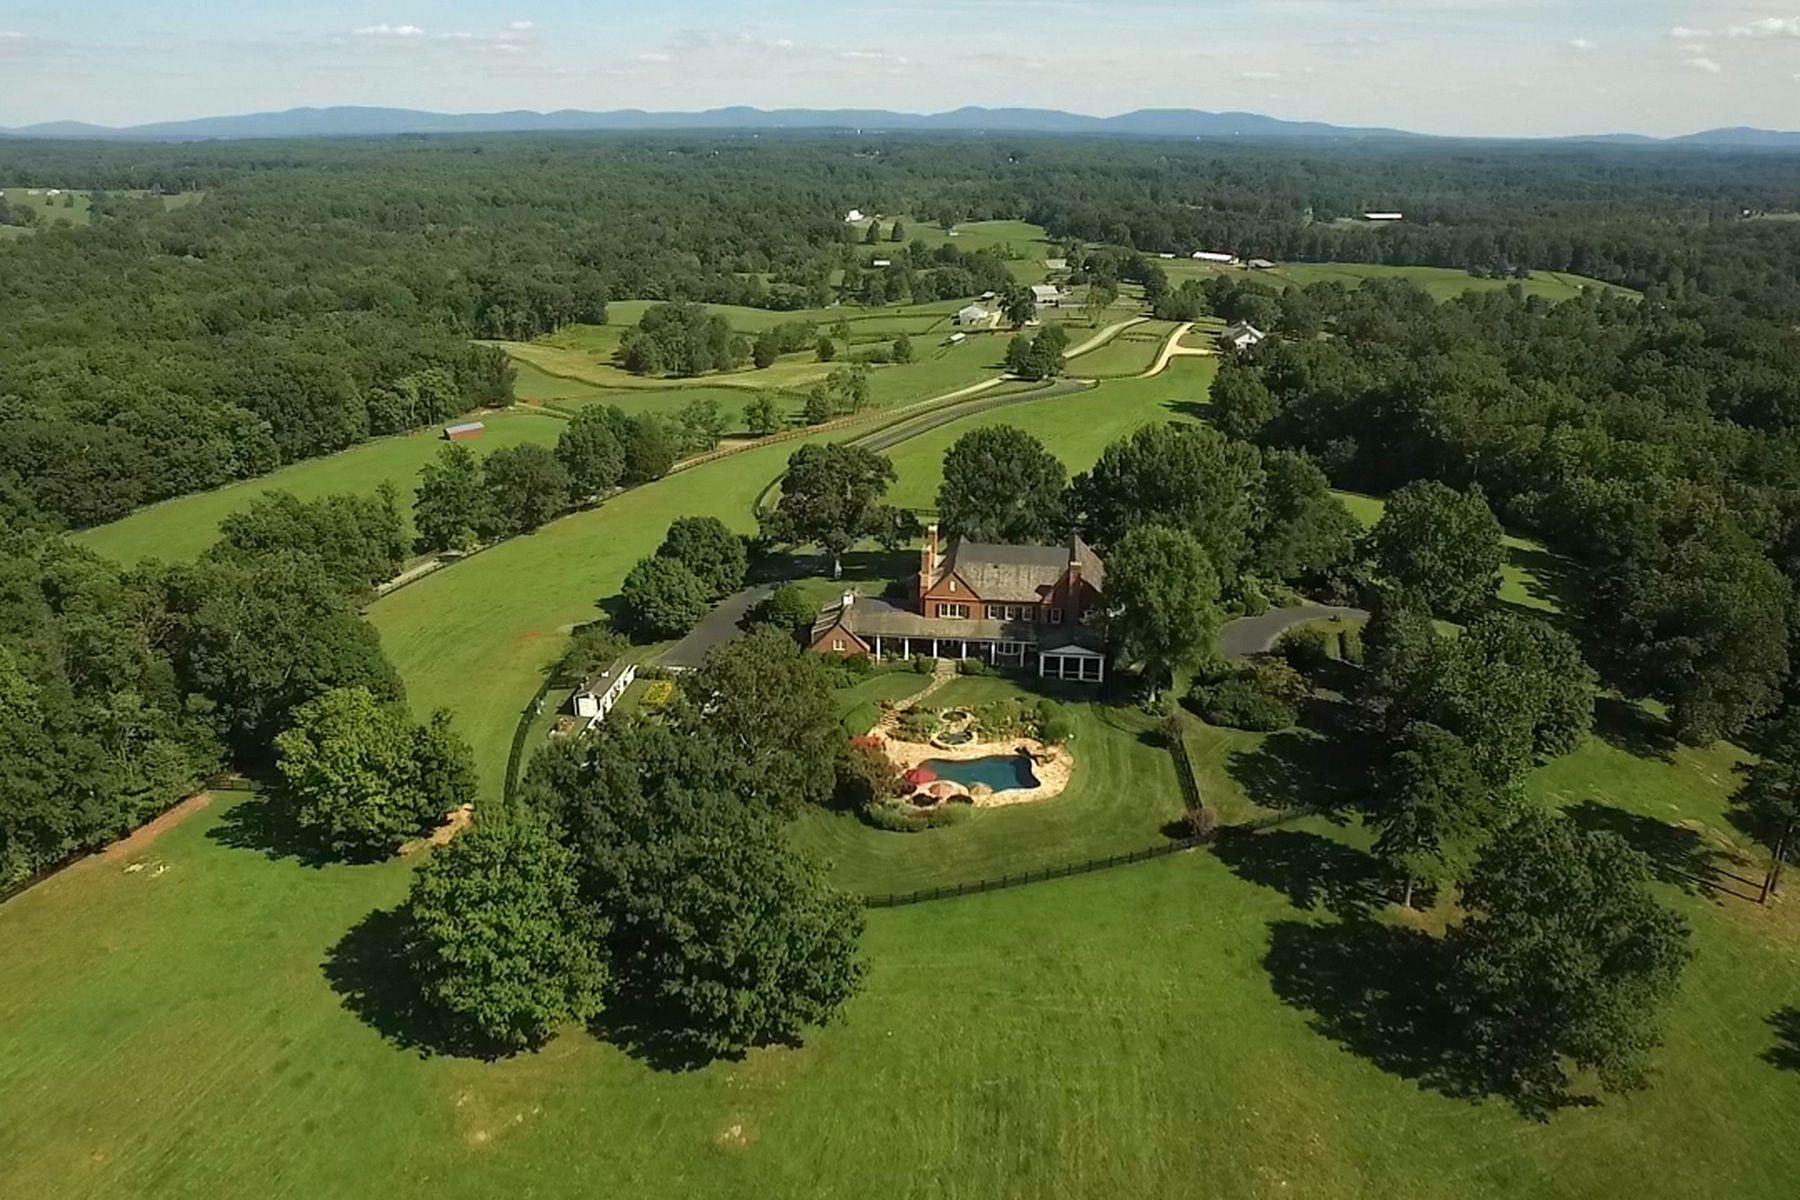 Single Family Home for Sale at Mariah 4780 Catterton Rd Free Union Charlottesville, Virginia 22901 United StatesIn/Around: Charlottesville